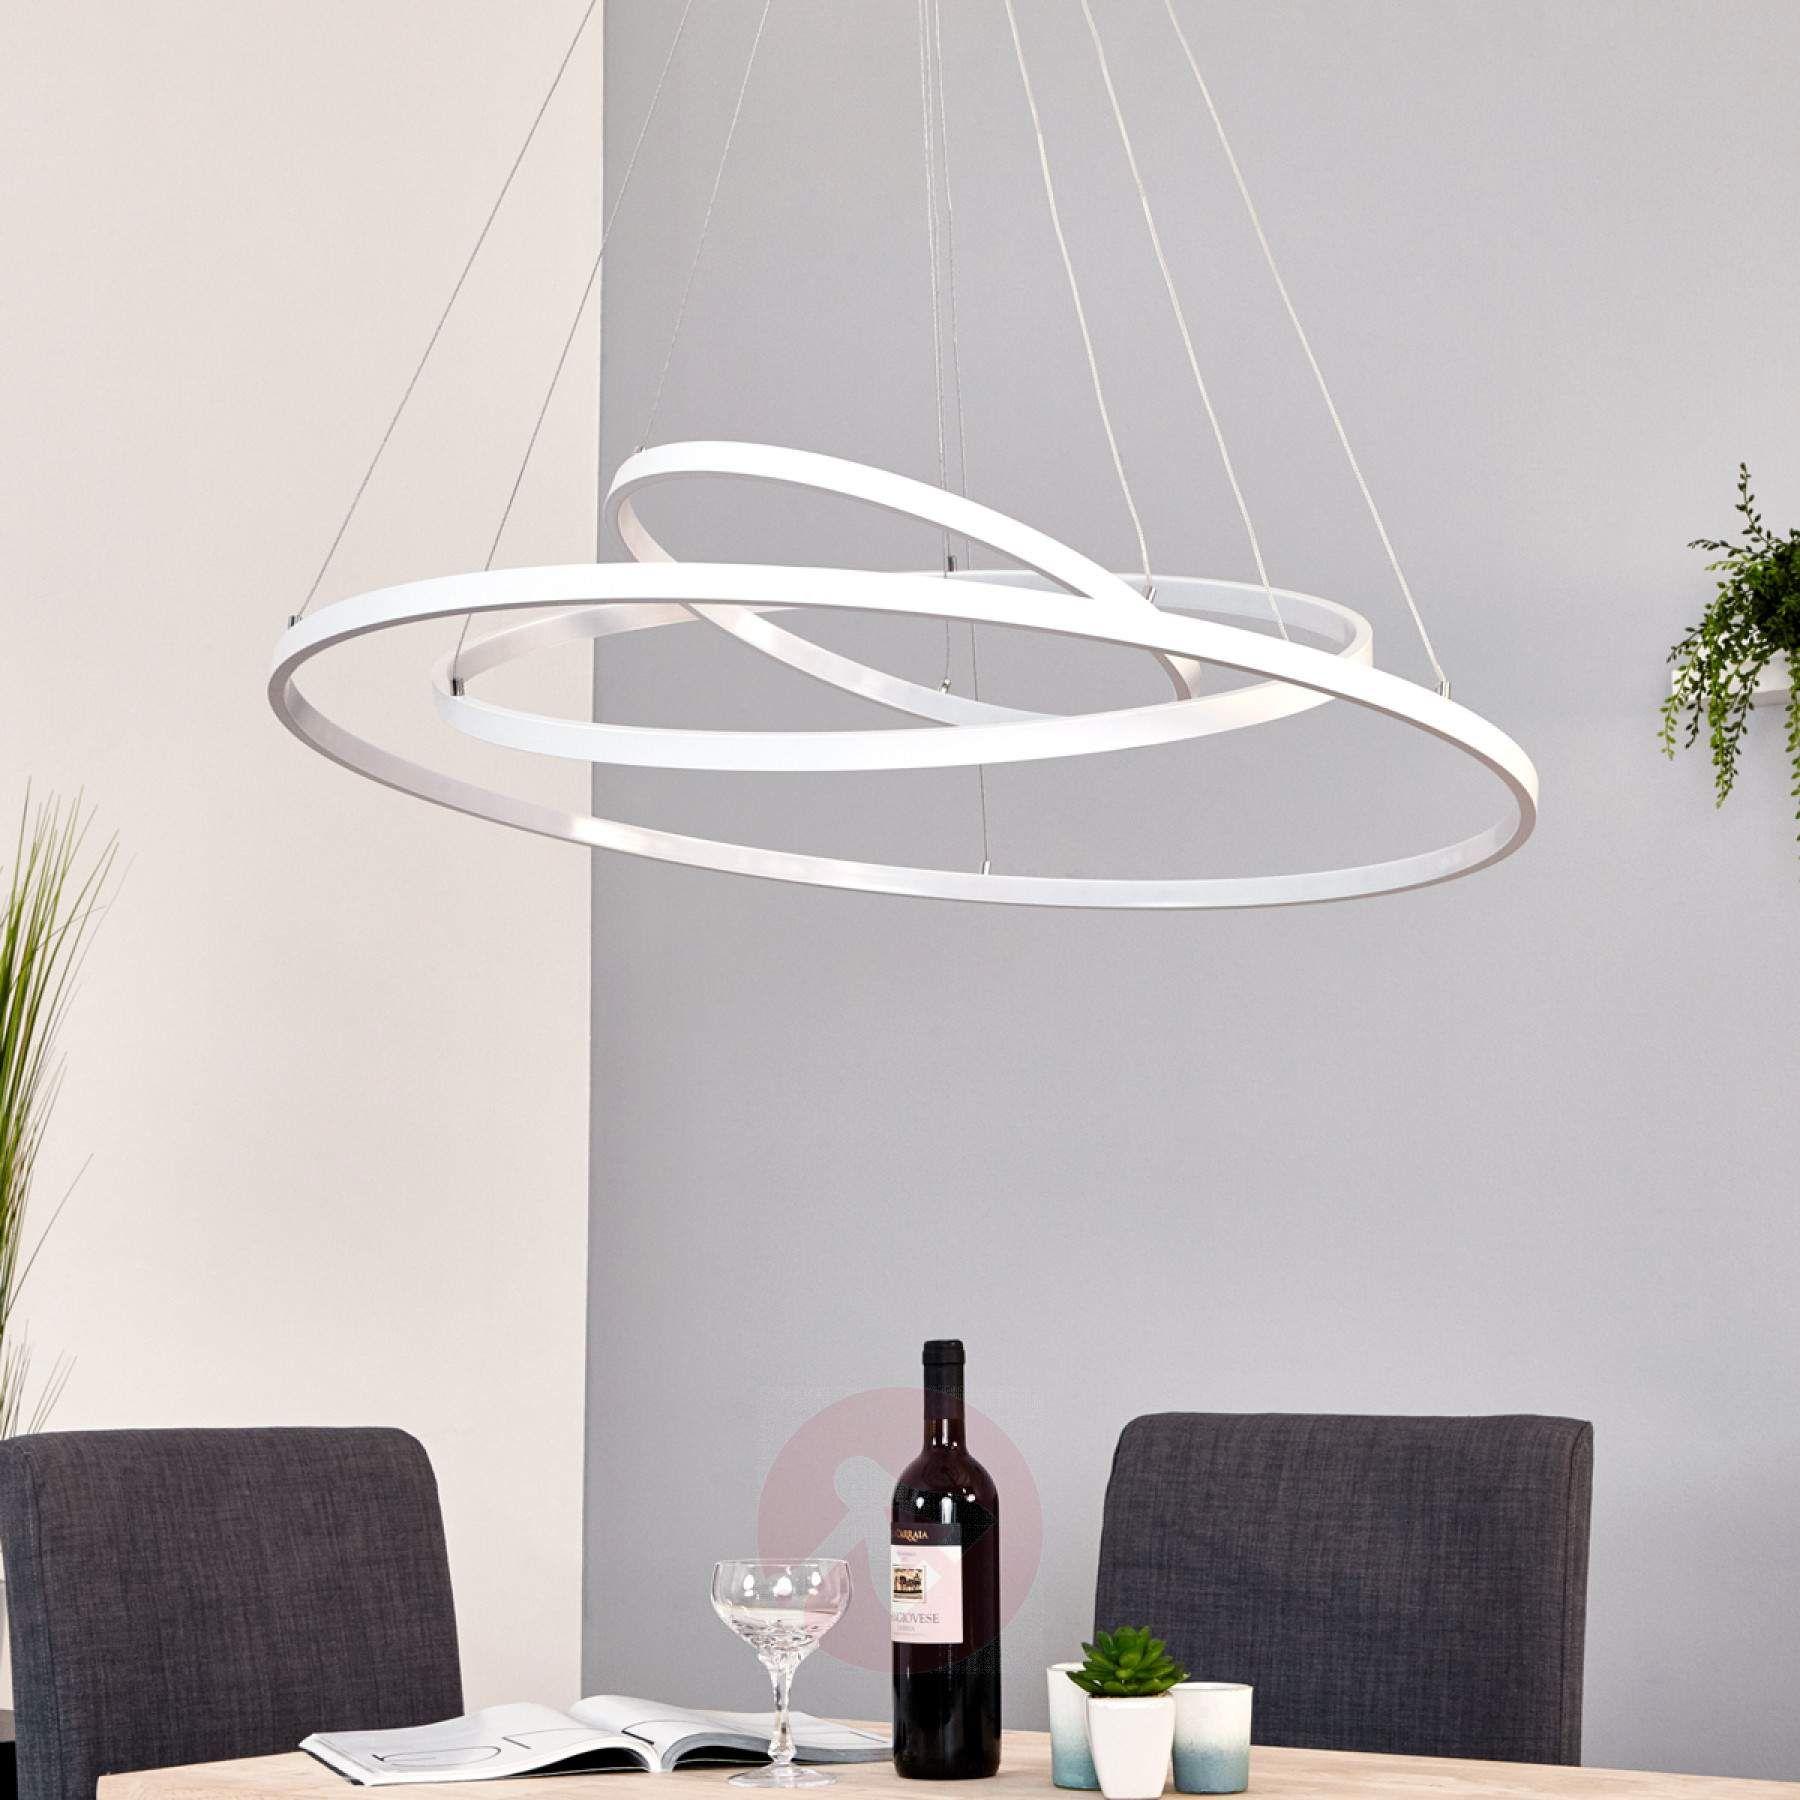 Powerful Led Pendant Lamp Eline With 3 Rings 9987046 02 Lampara Colgante Led Lampara